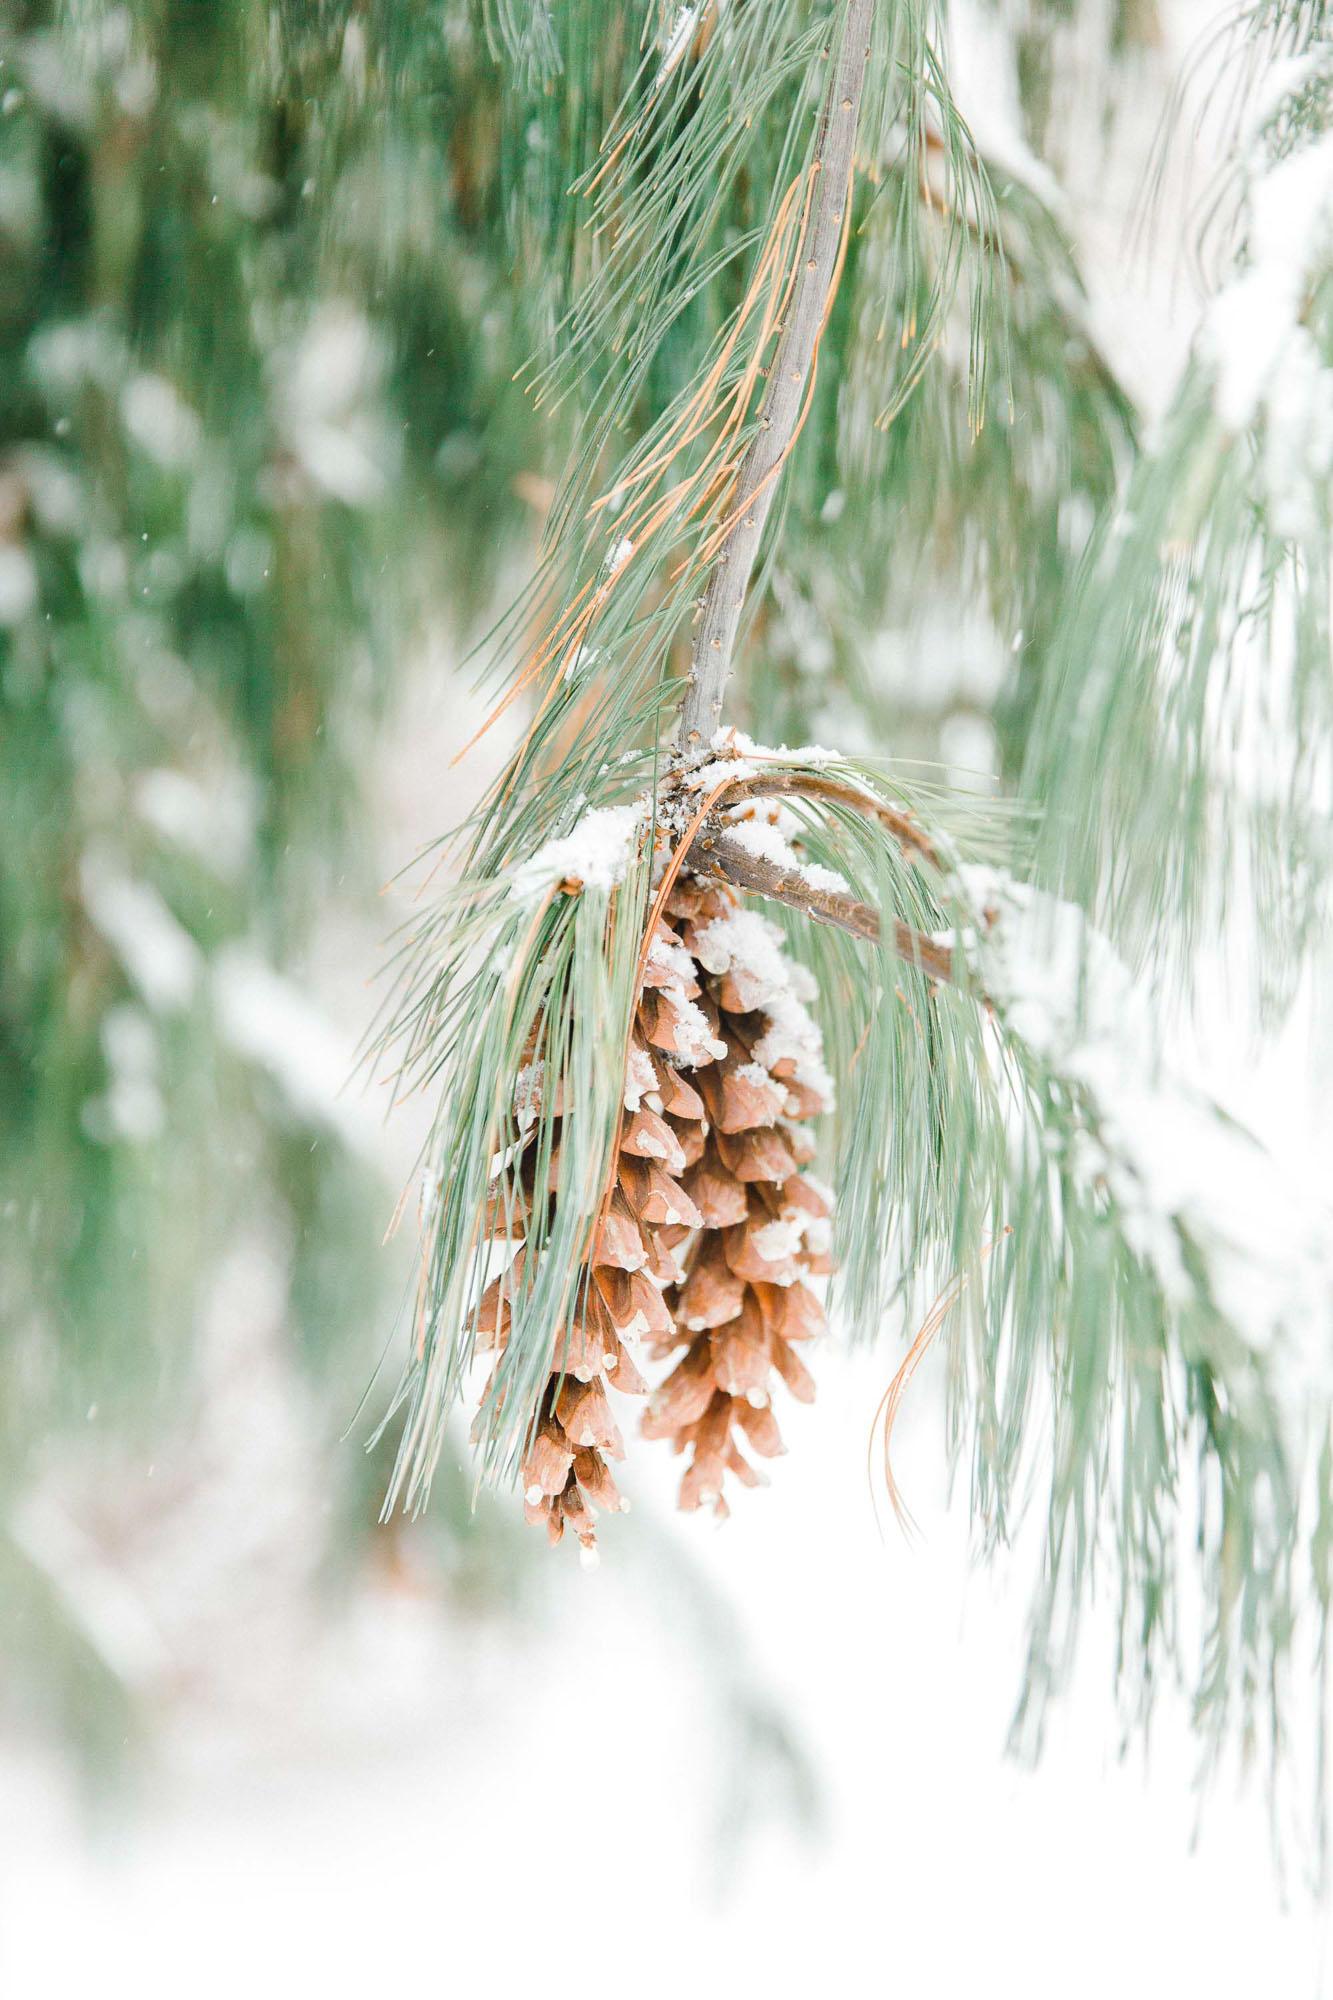 snowy-sand-springs-country-club-drums-pa-christmas-wedding-34438.jpg